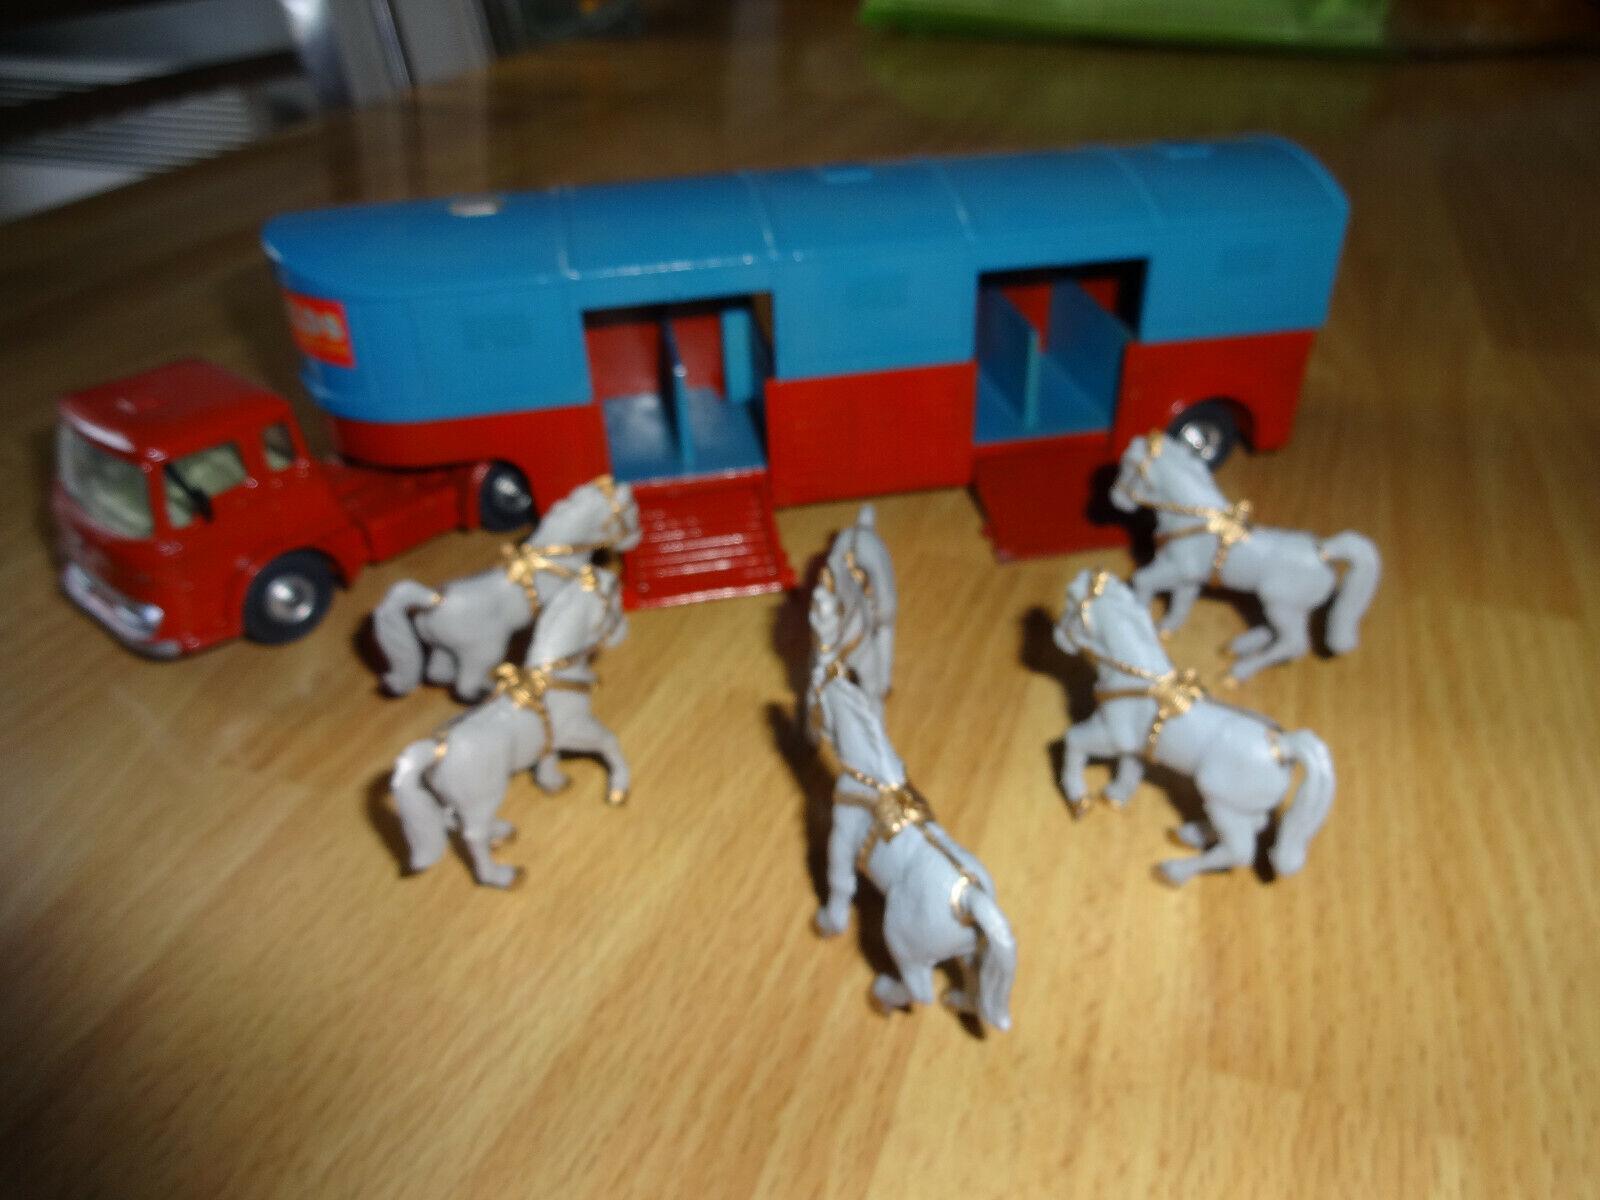 CORGI giocattoli Superbe Restauration d'un BEDFORD 2110159 scatola HORSE